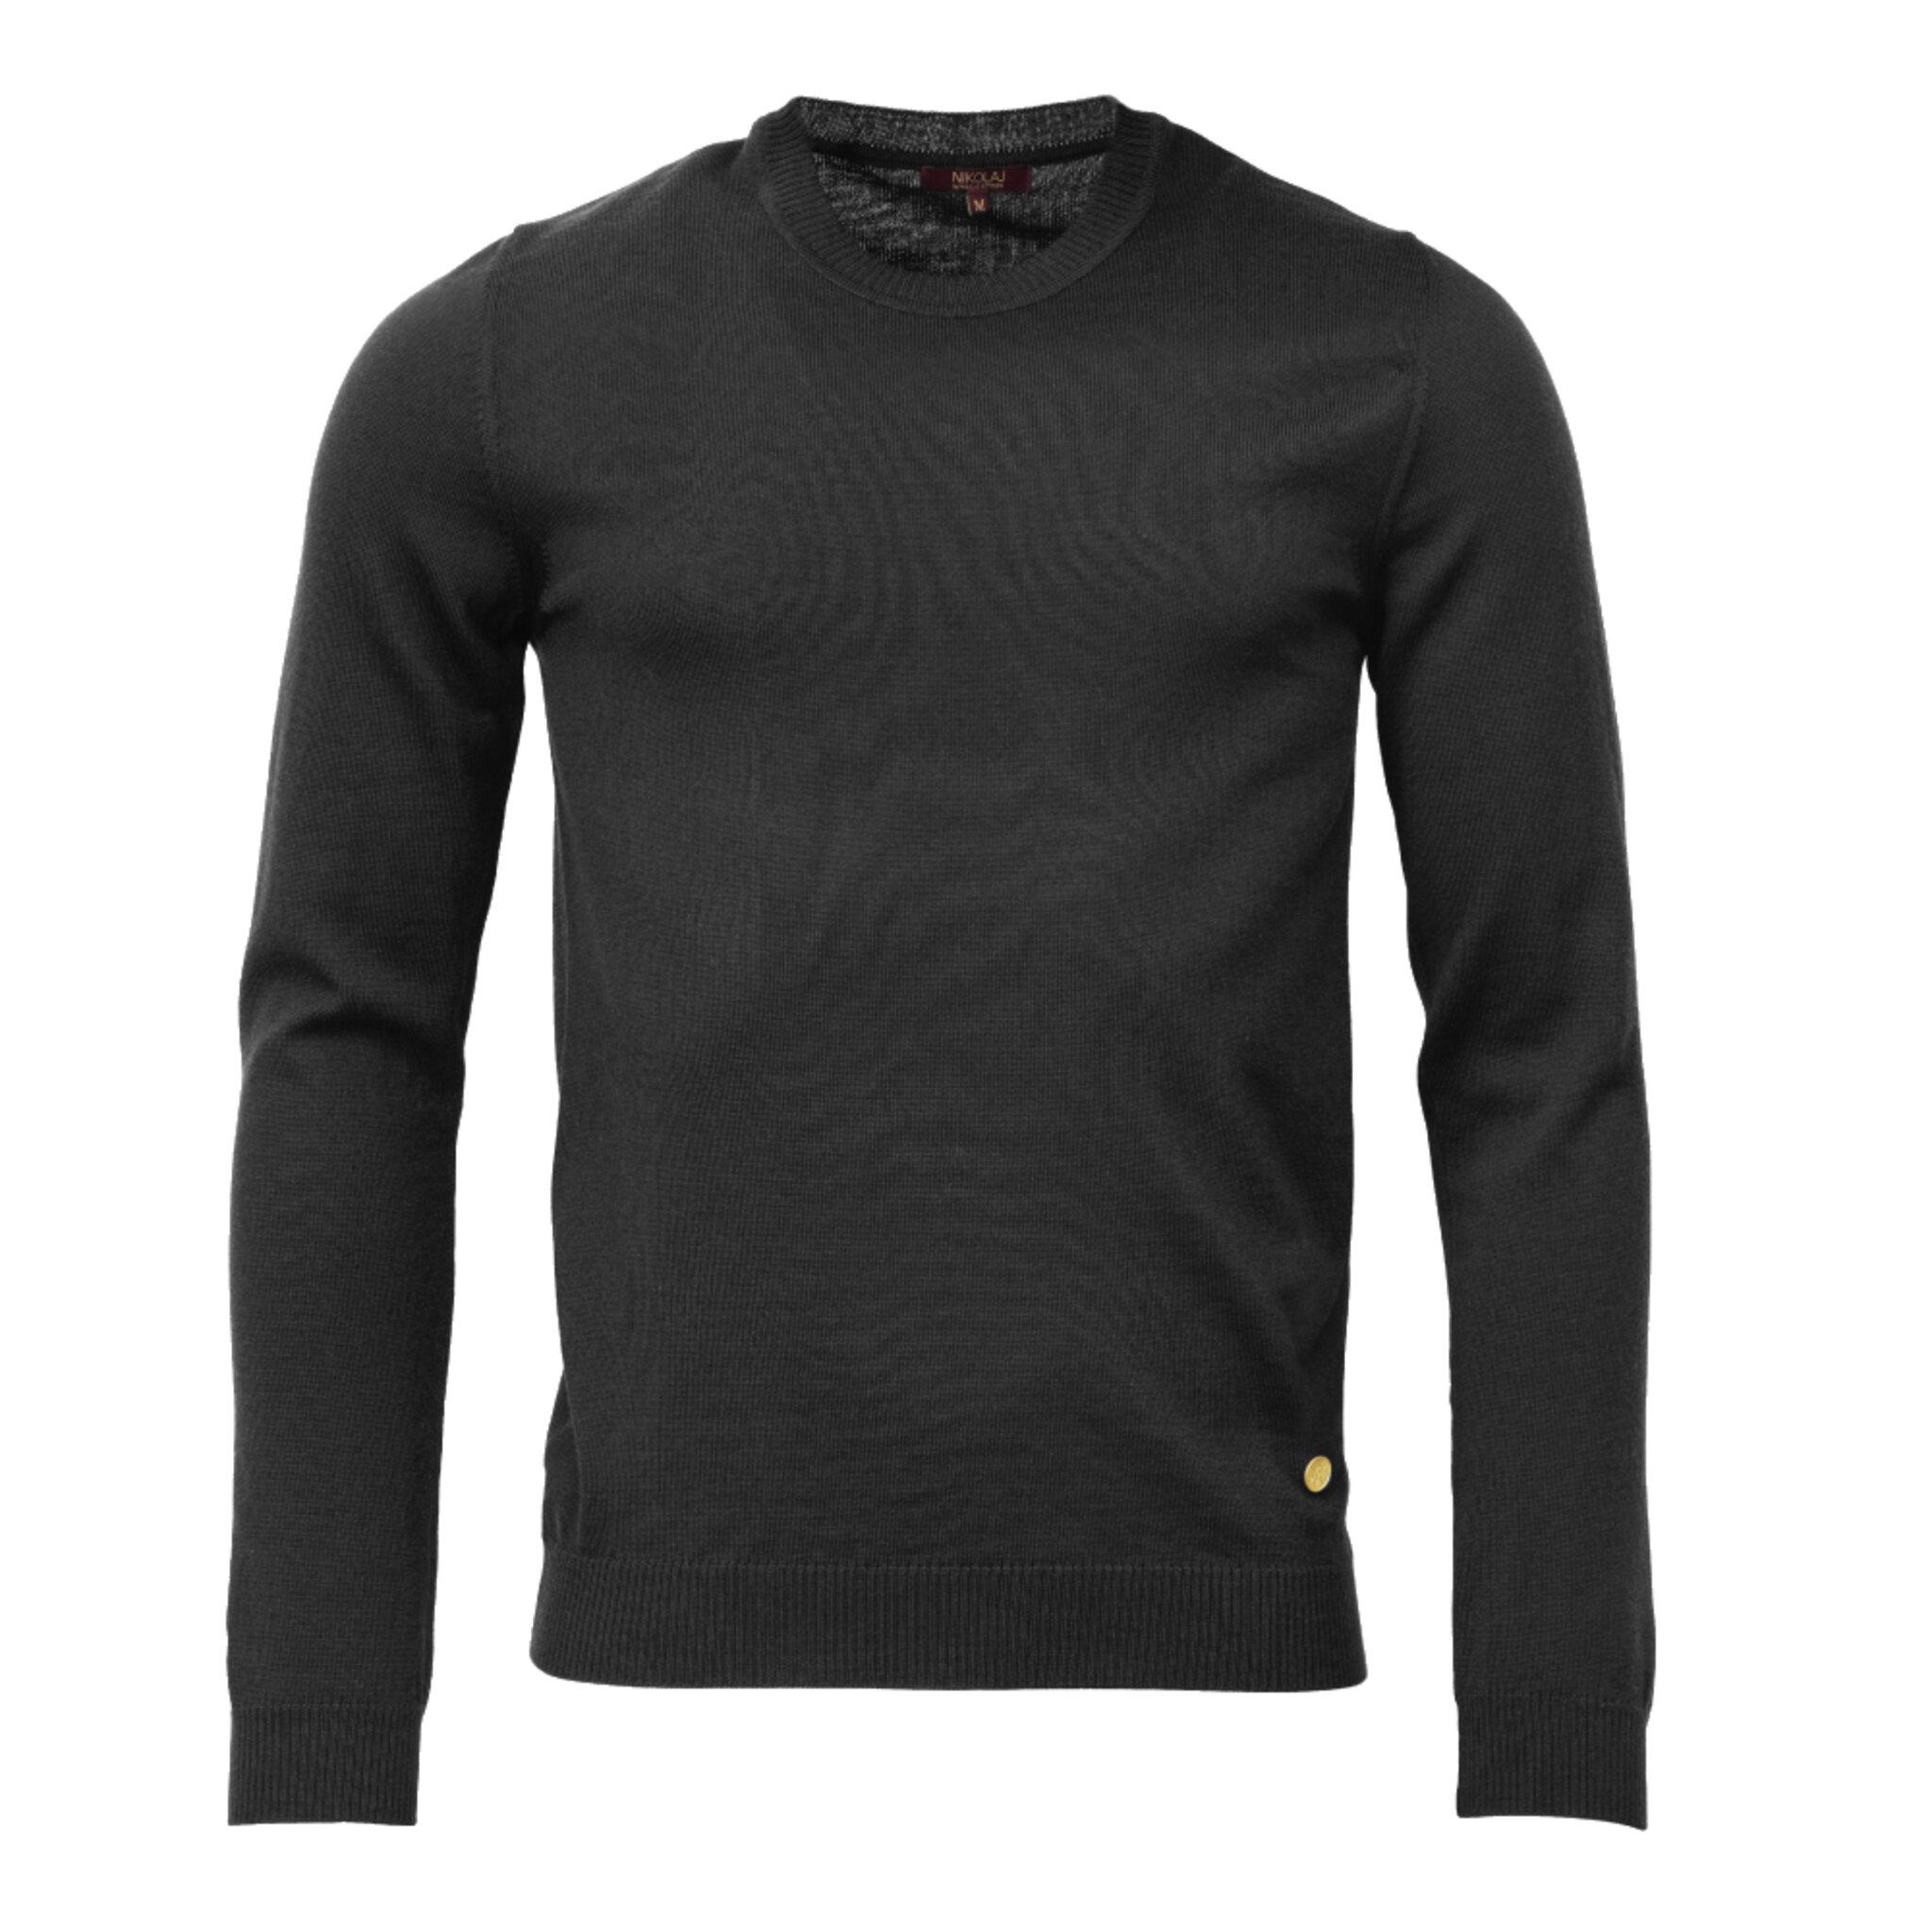 Konstantin Crew Neck Merino Wool Sweater